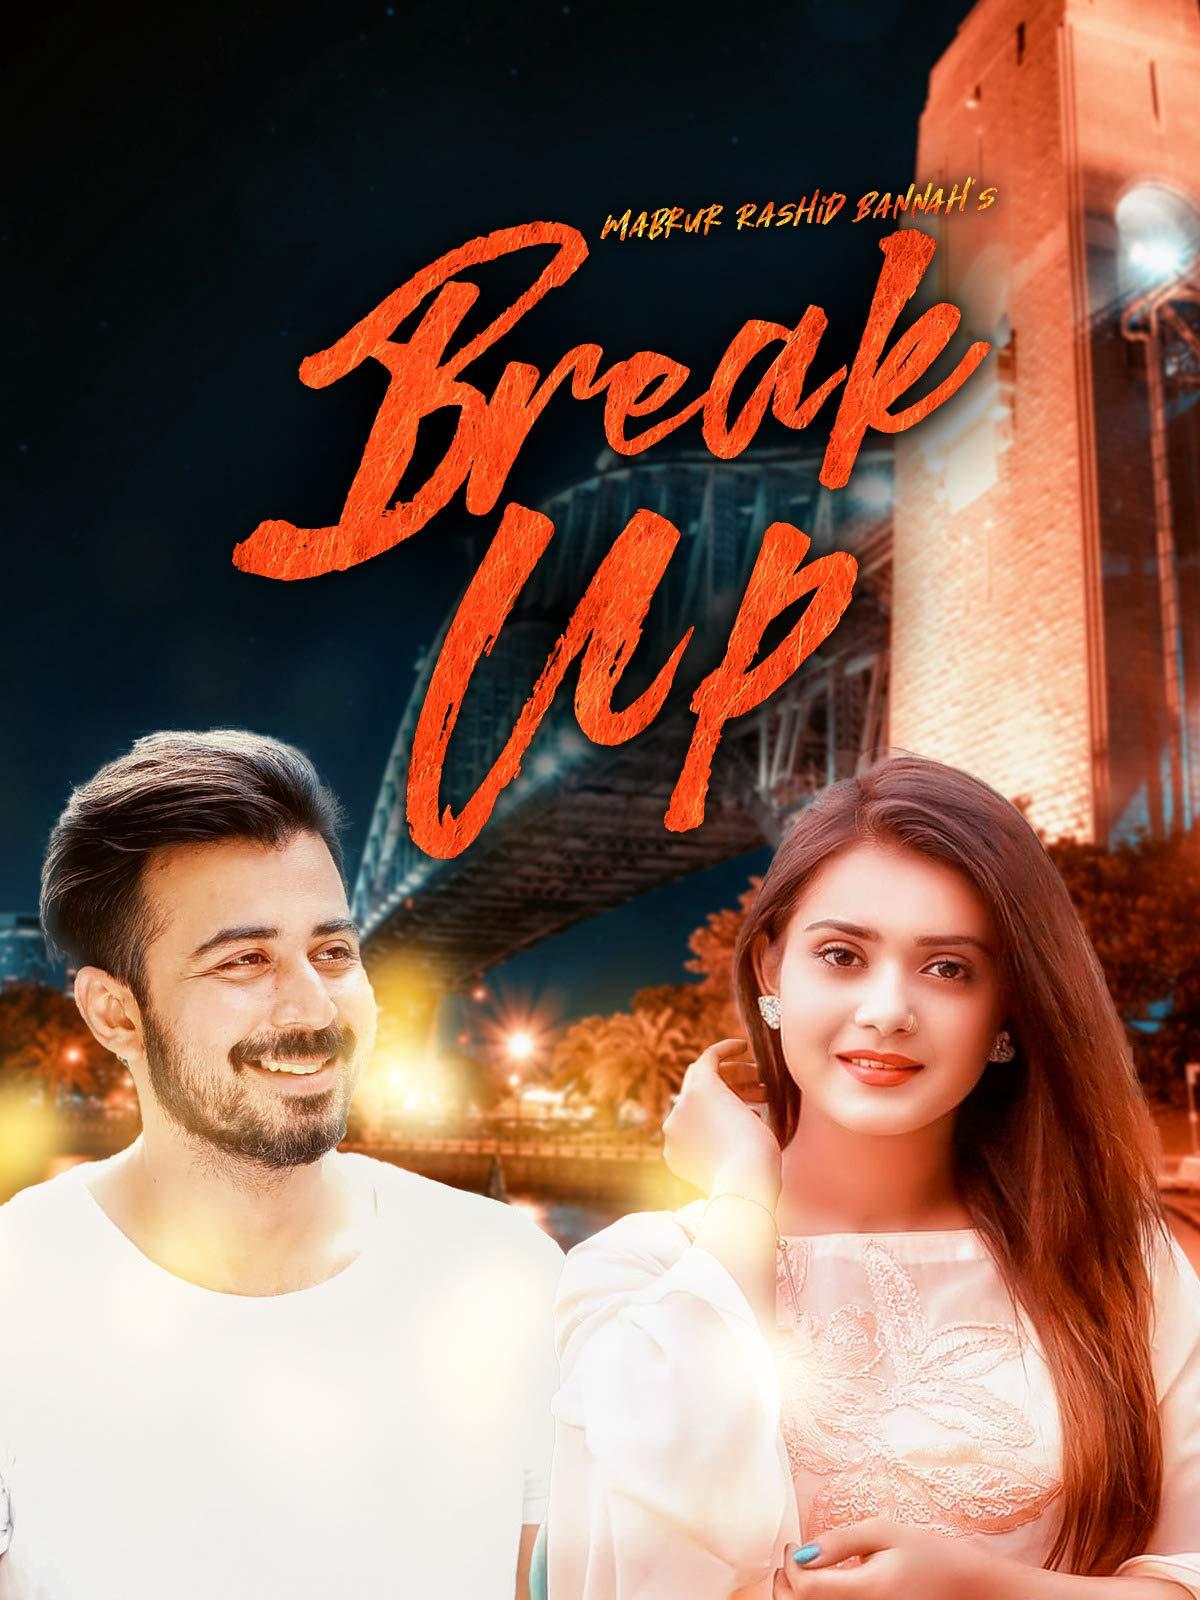 BreakUp | Afran Nisho | Tanjin Tisha | Mabrur Rashid Bannah